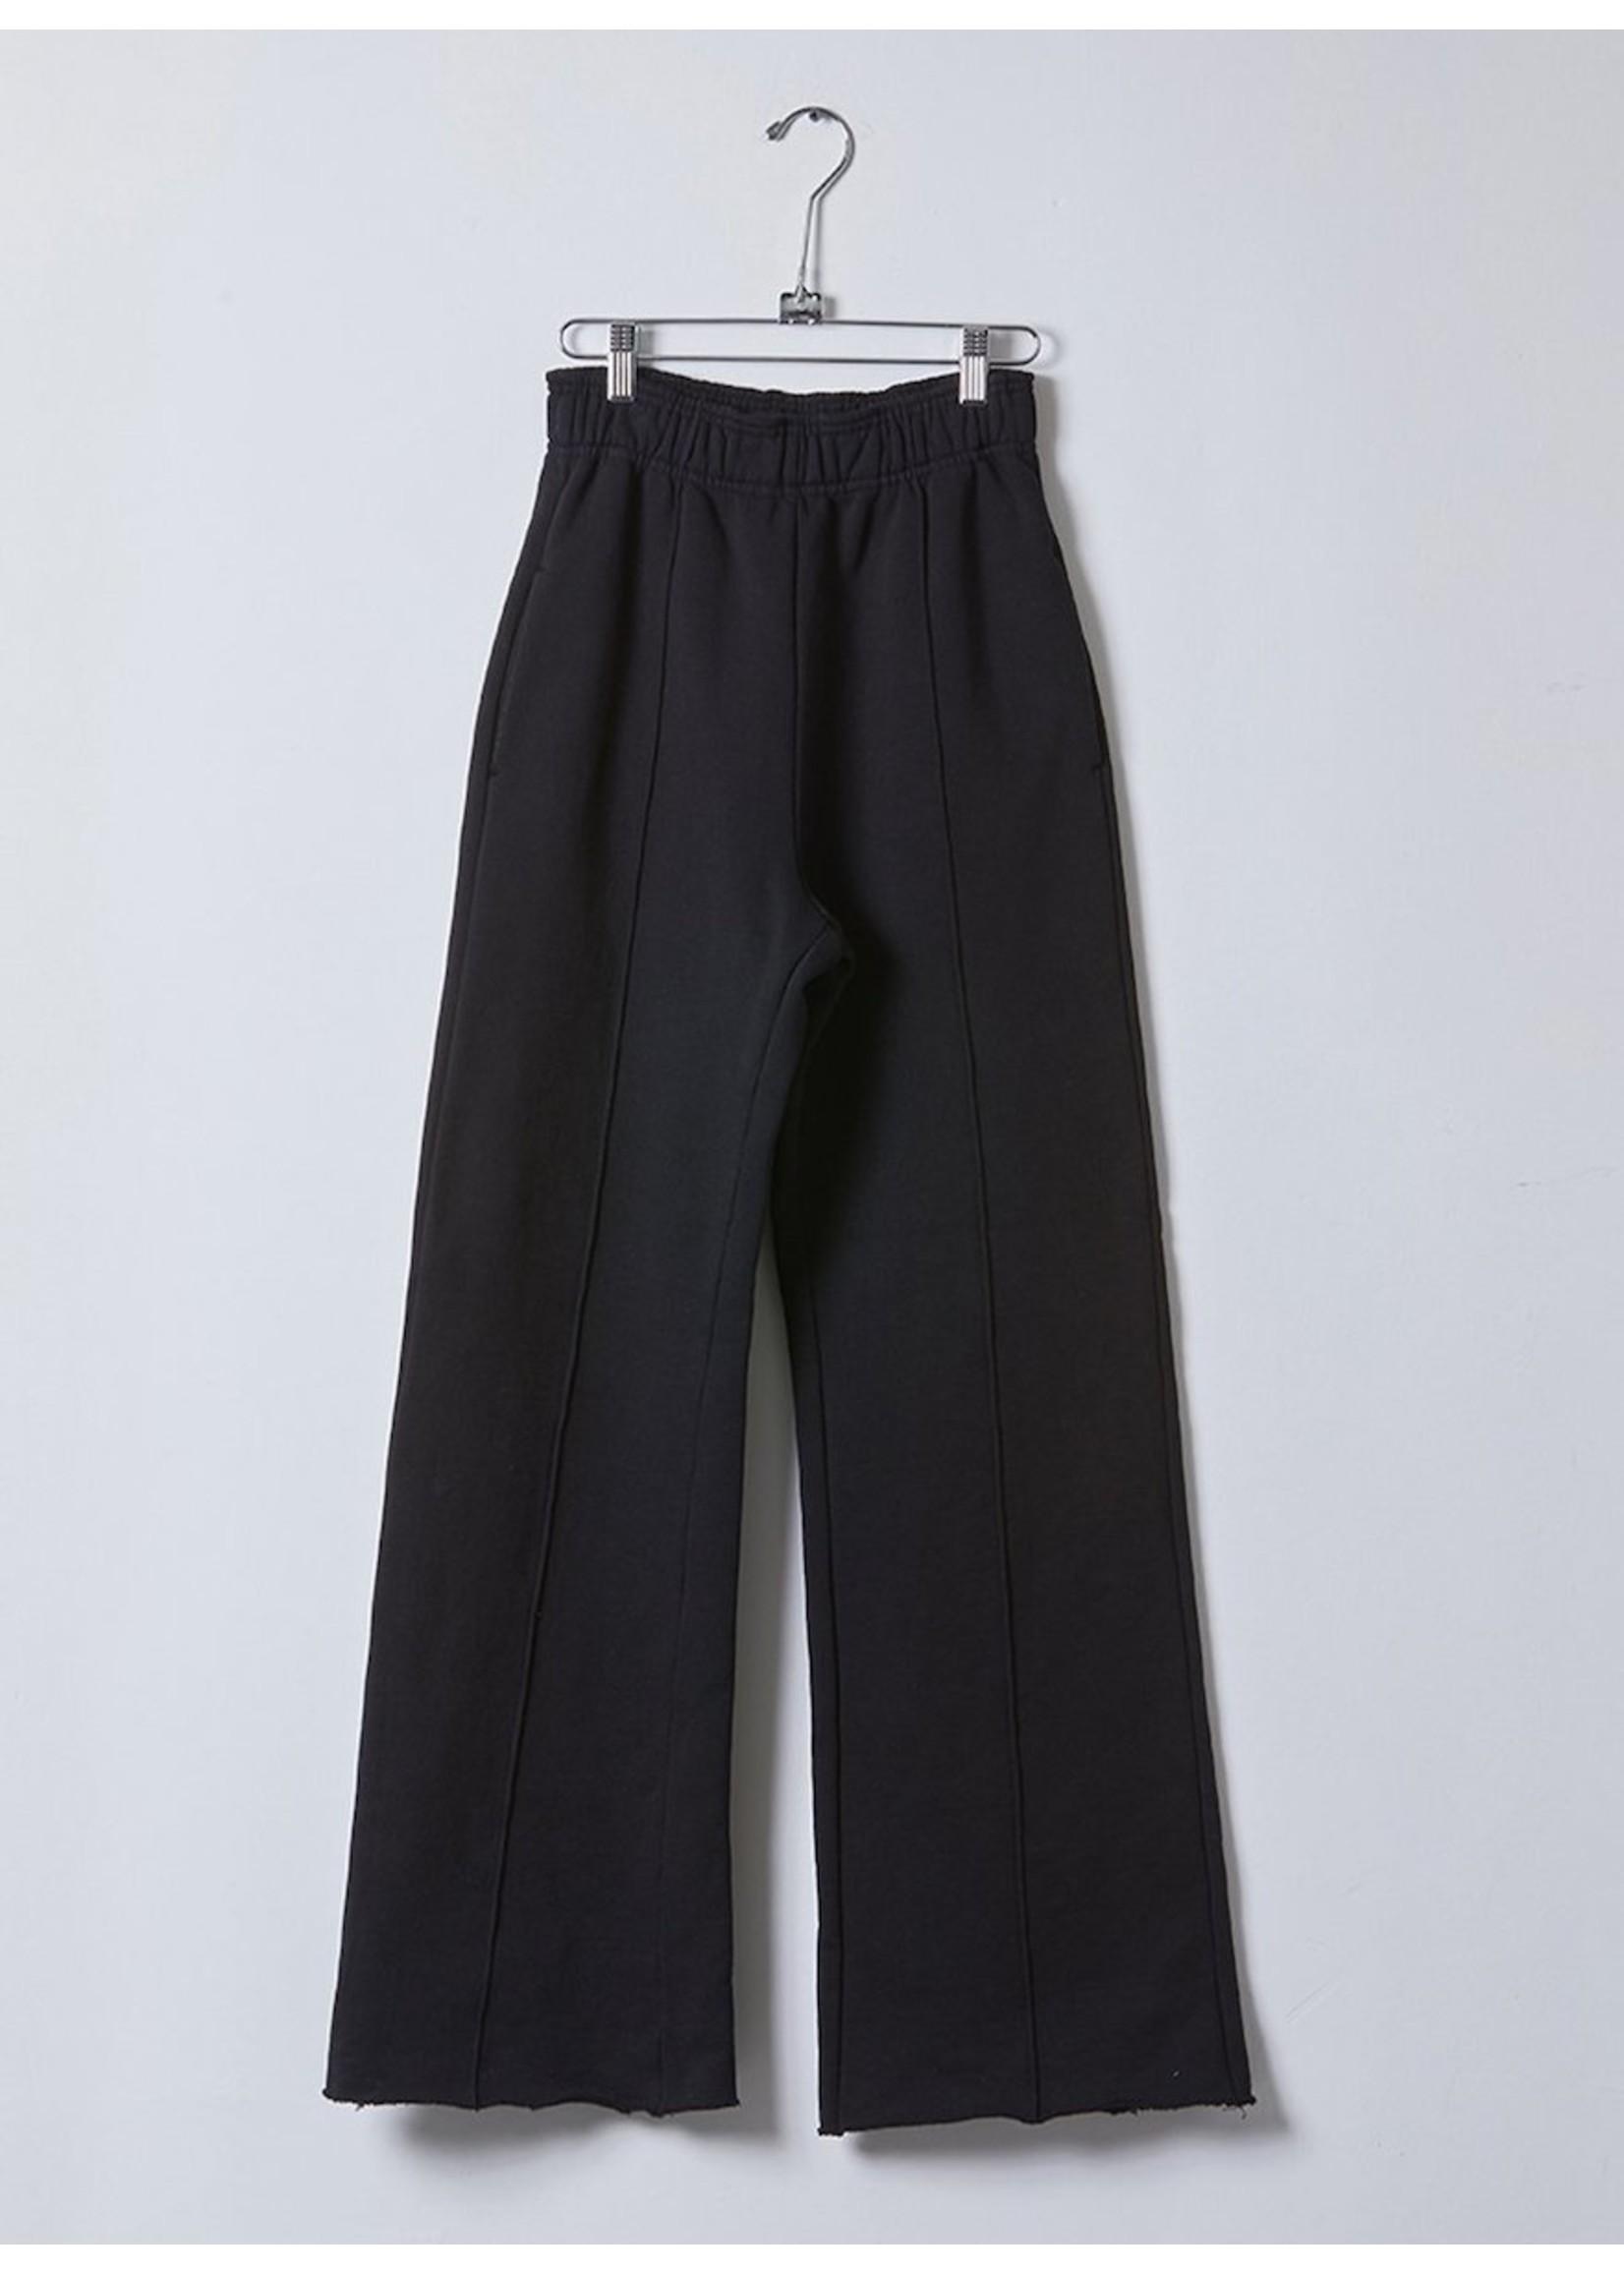 Atelier Delphine Atelier Delphine Serena Black Sweat Pant